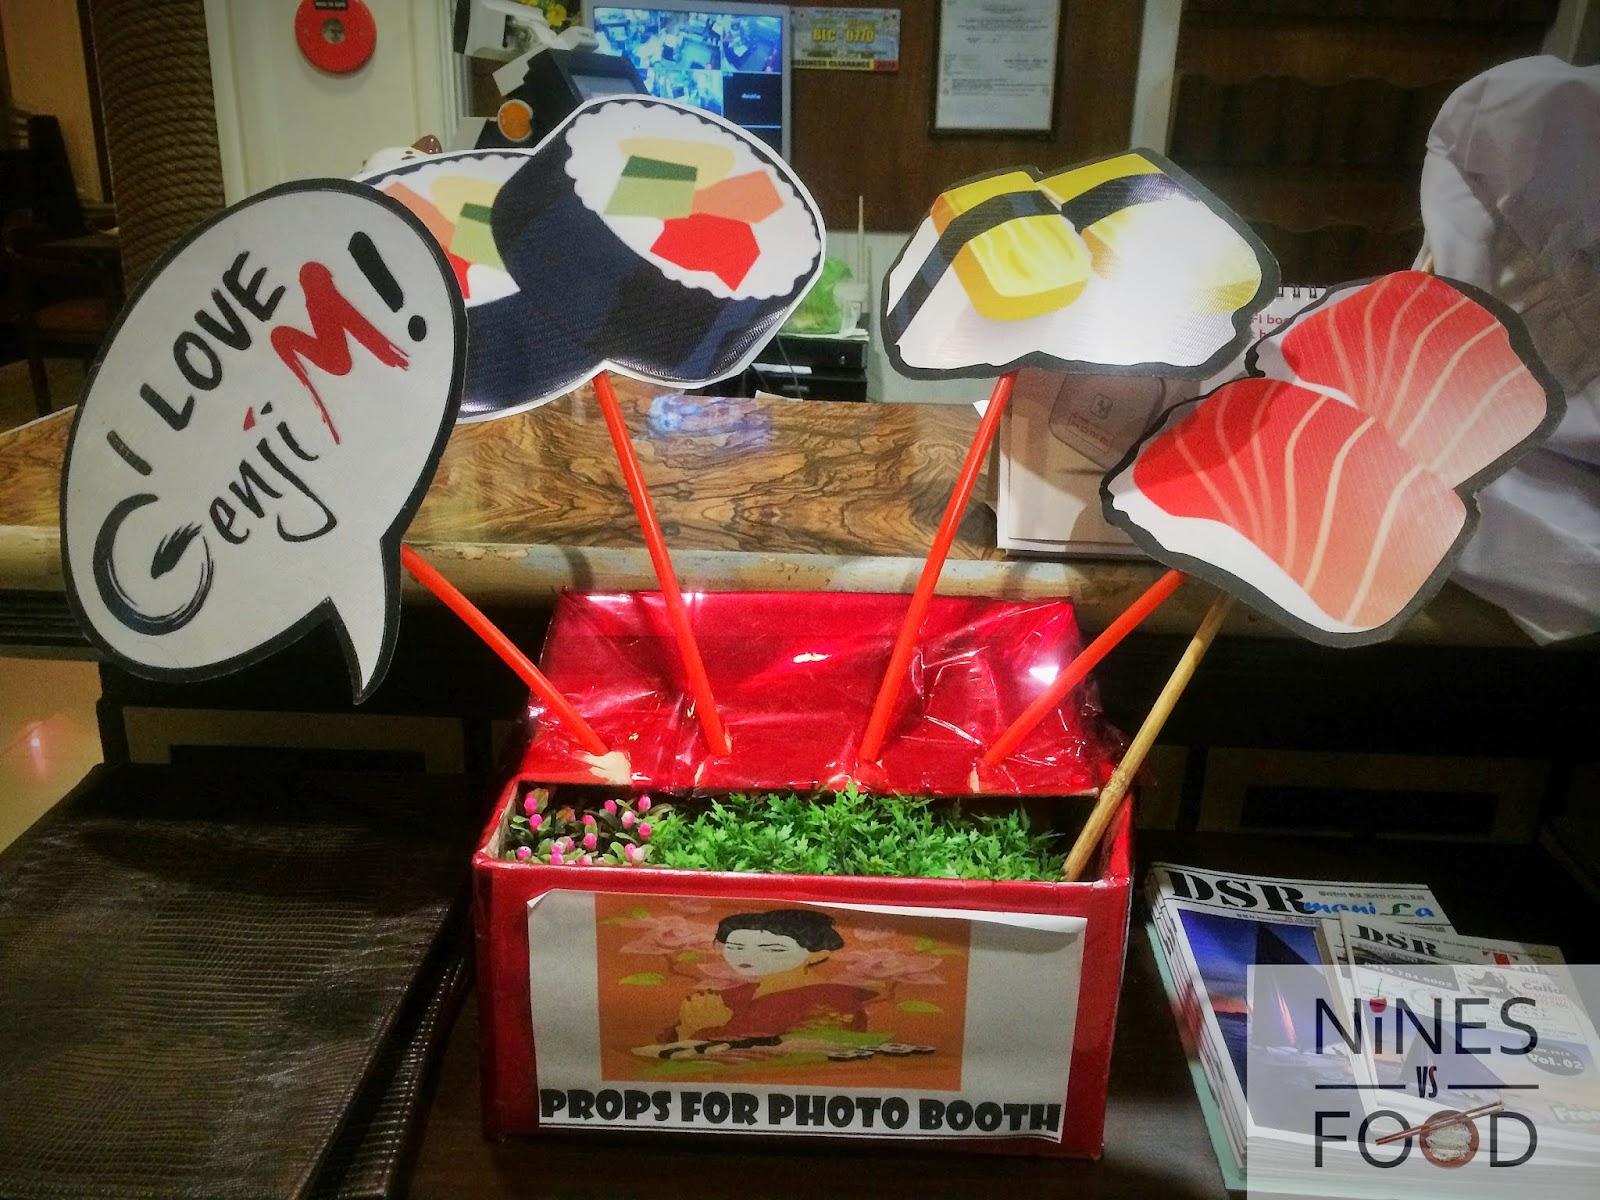 Nines vs. Food - Genji M Kalayaan Makati-2.jpg